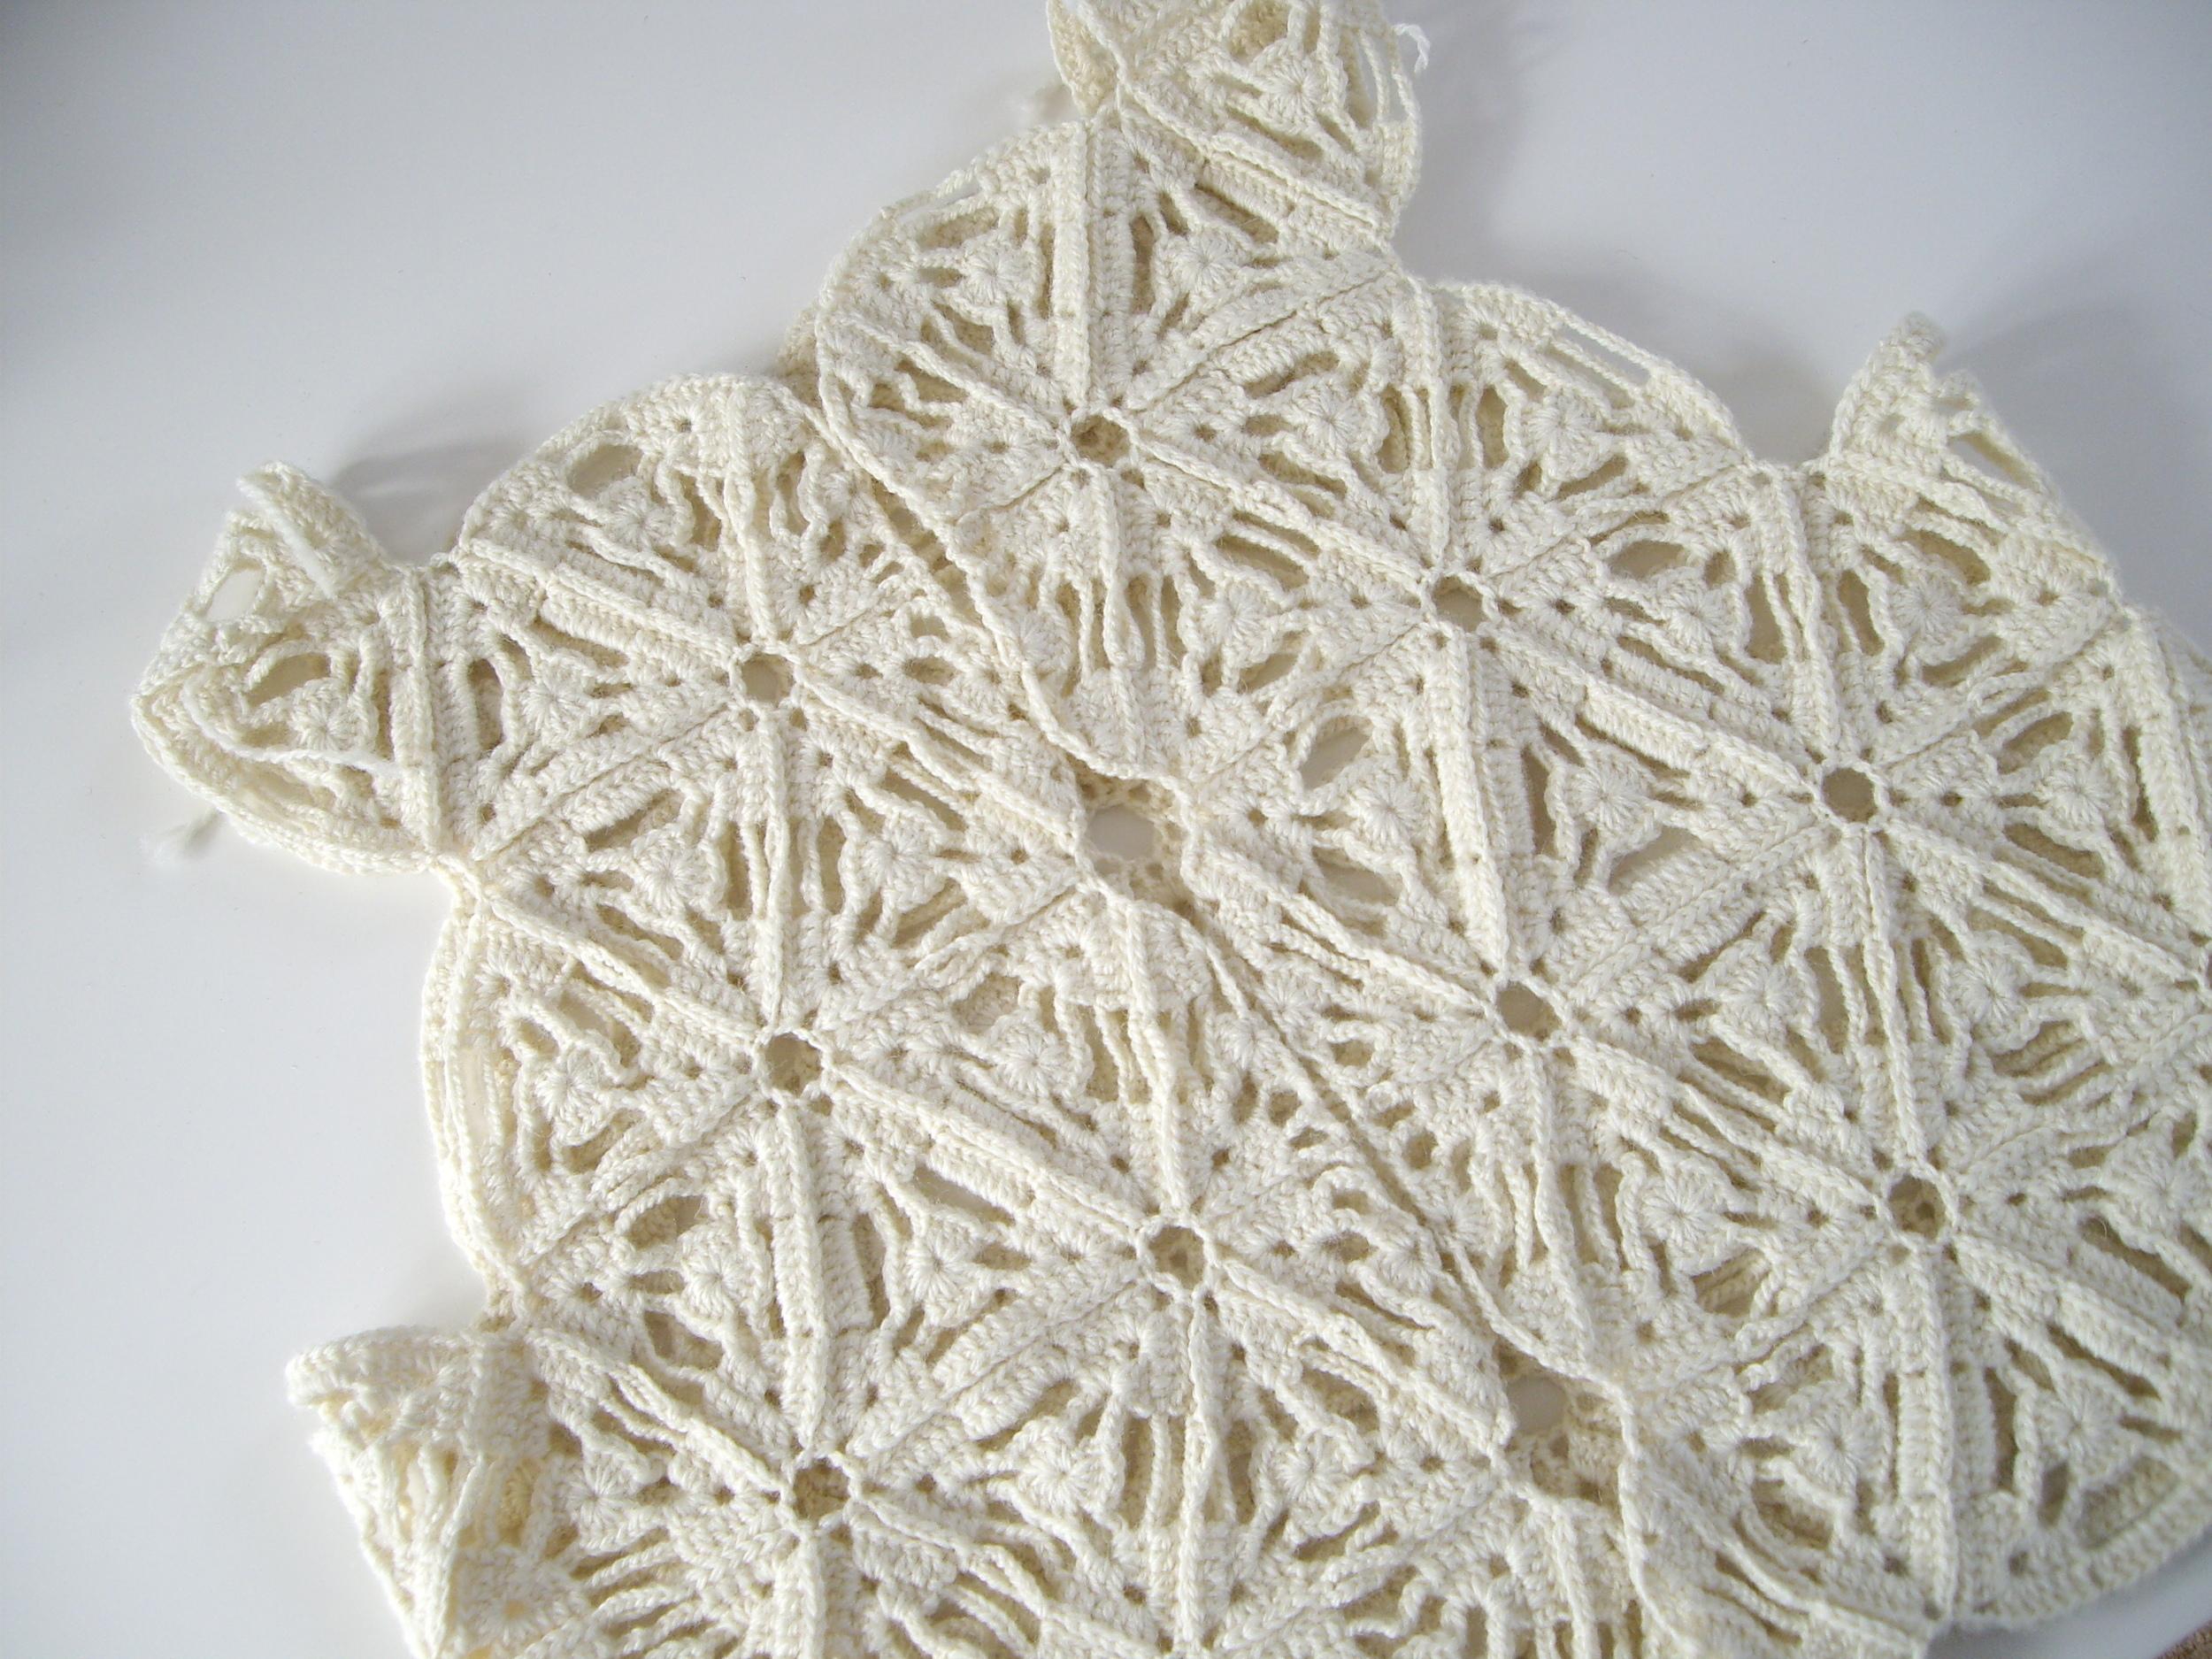 Crochet Bomber Jacket in progress